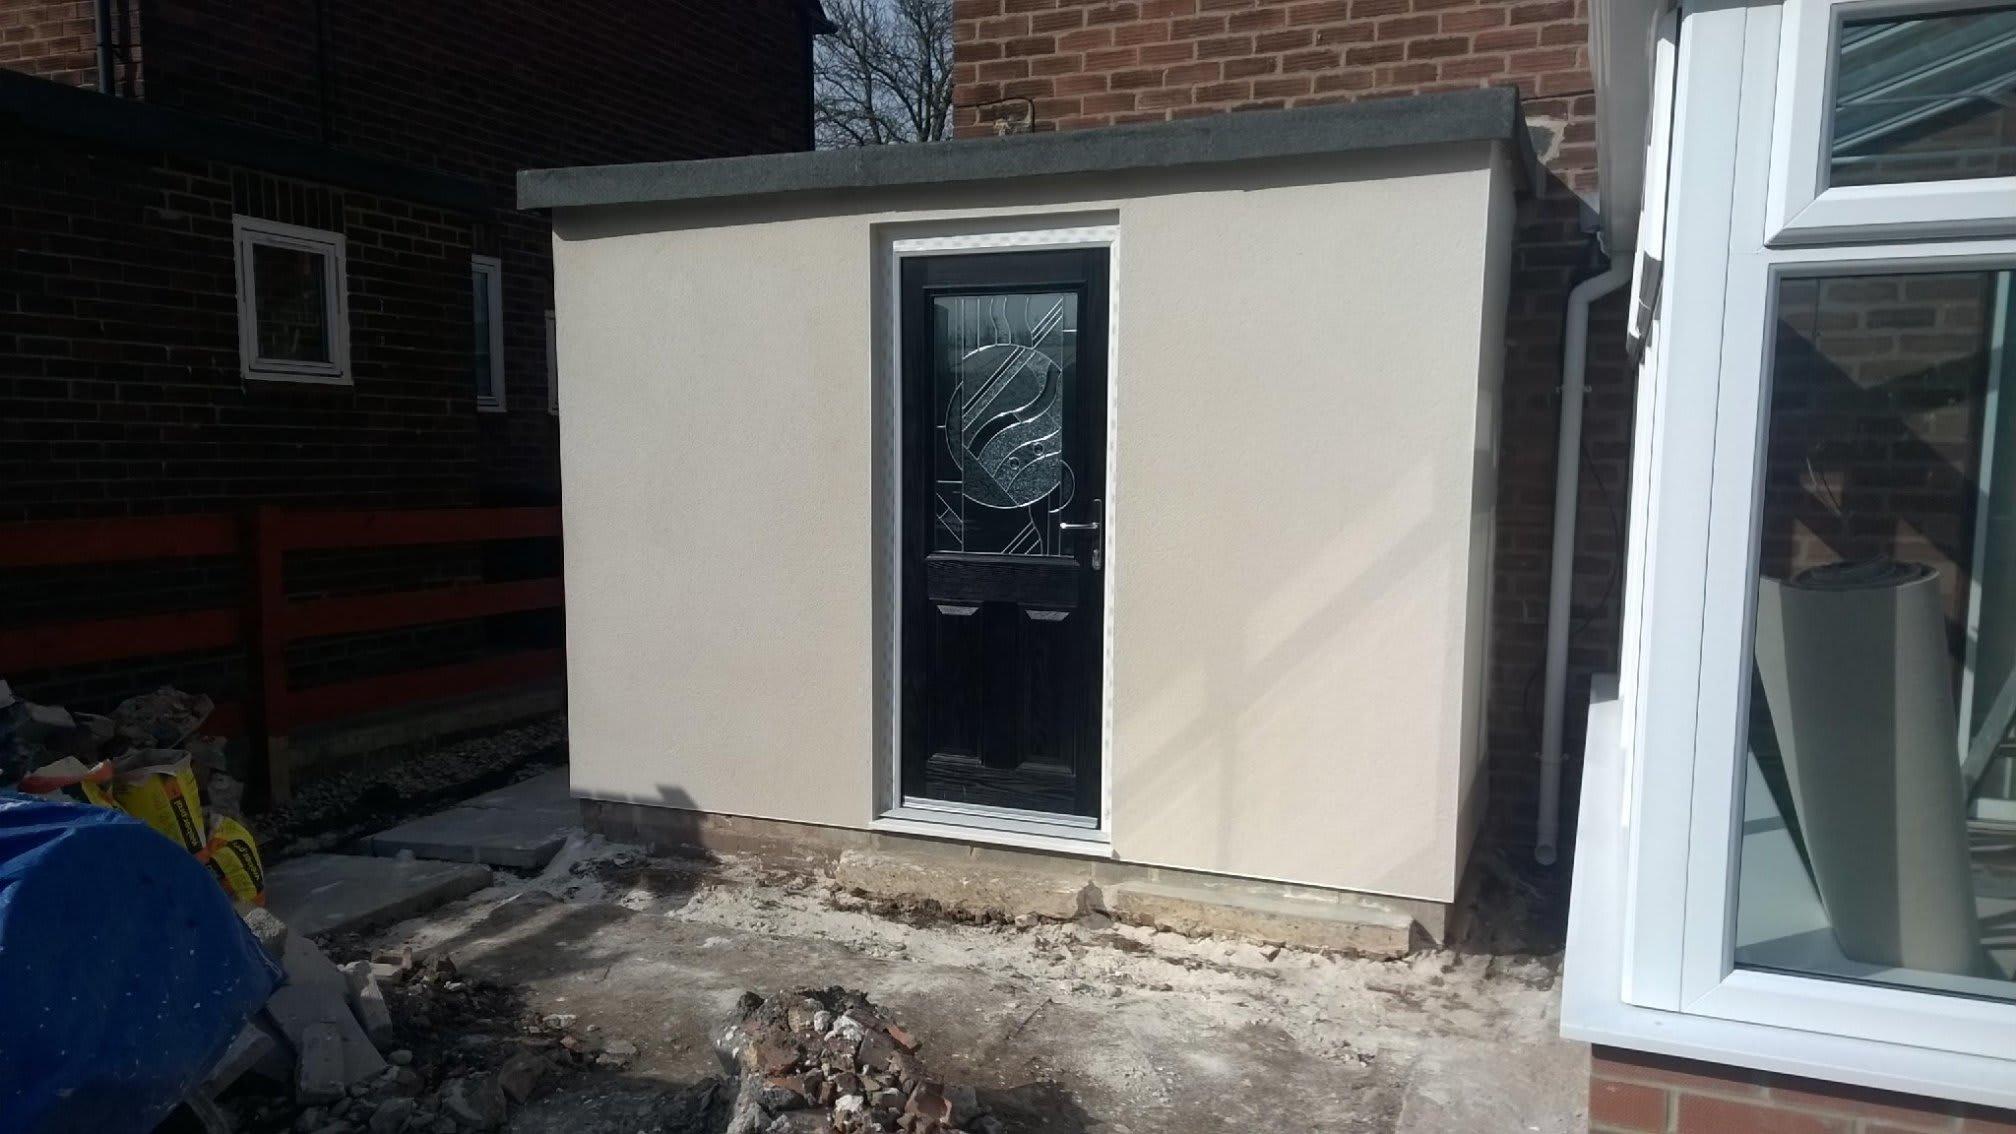 Neil Charlton Professional Plastering & Tiling Services   19 Dewley Rd, Newcastle Upon Tyne NE5 2NS   +44 191 271 4556